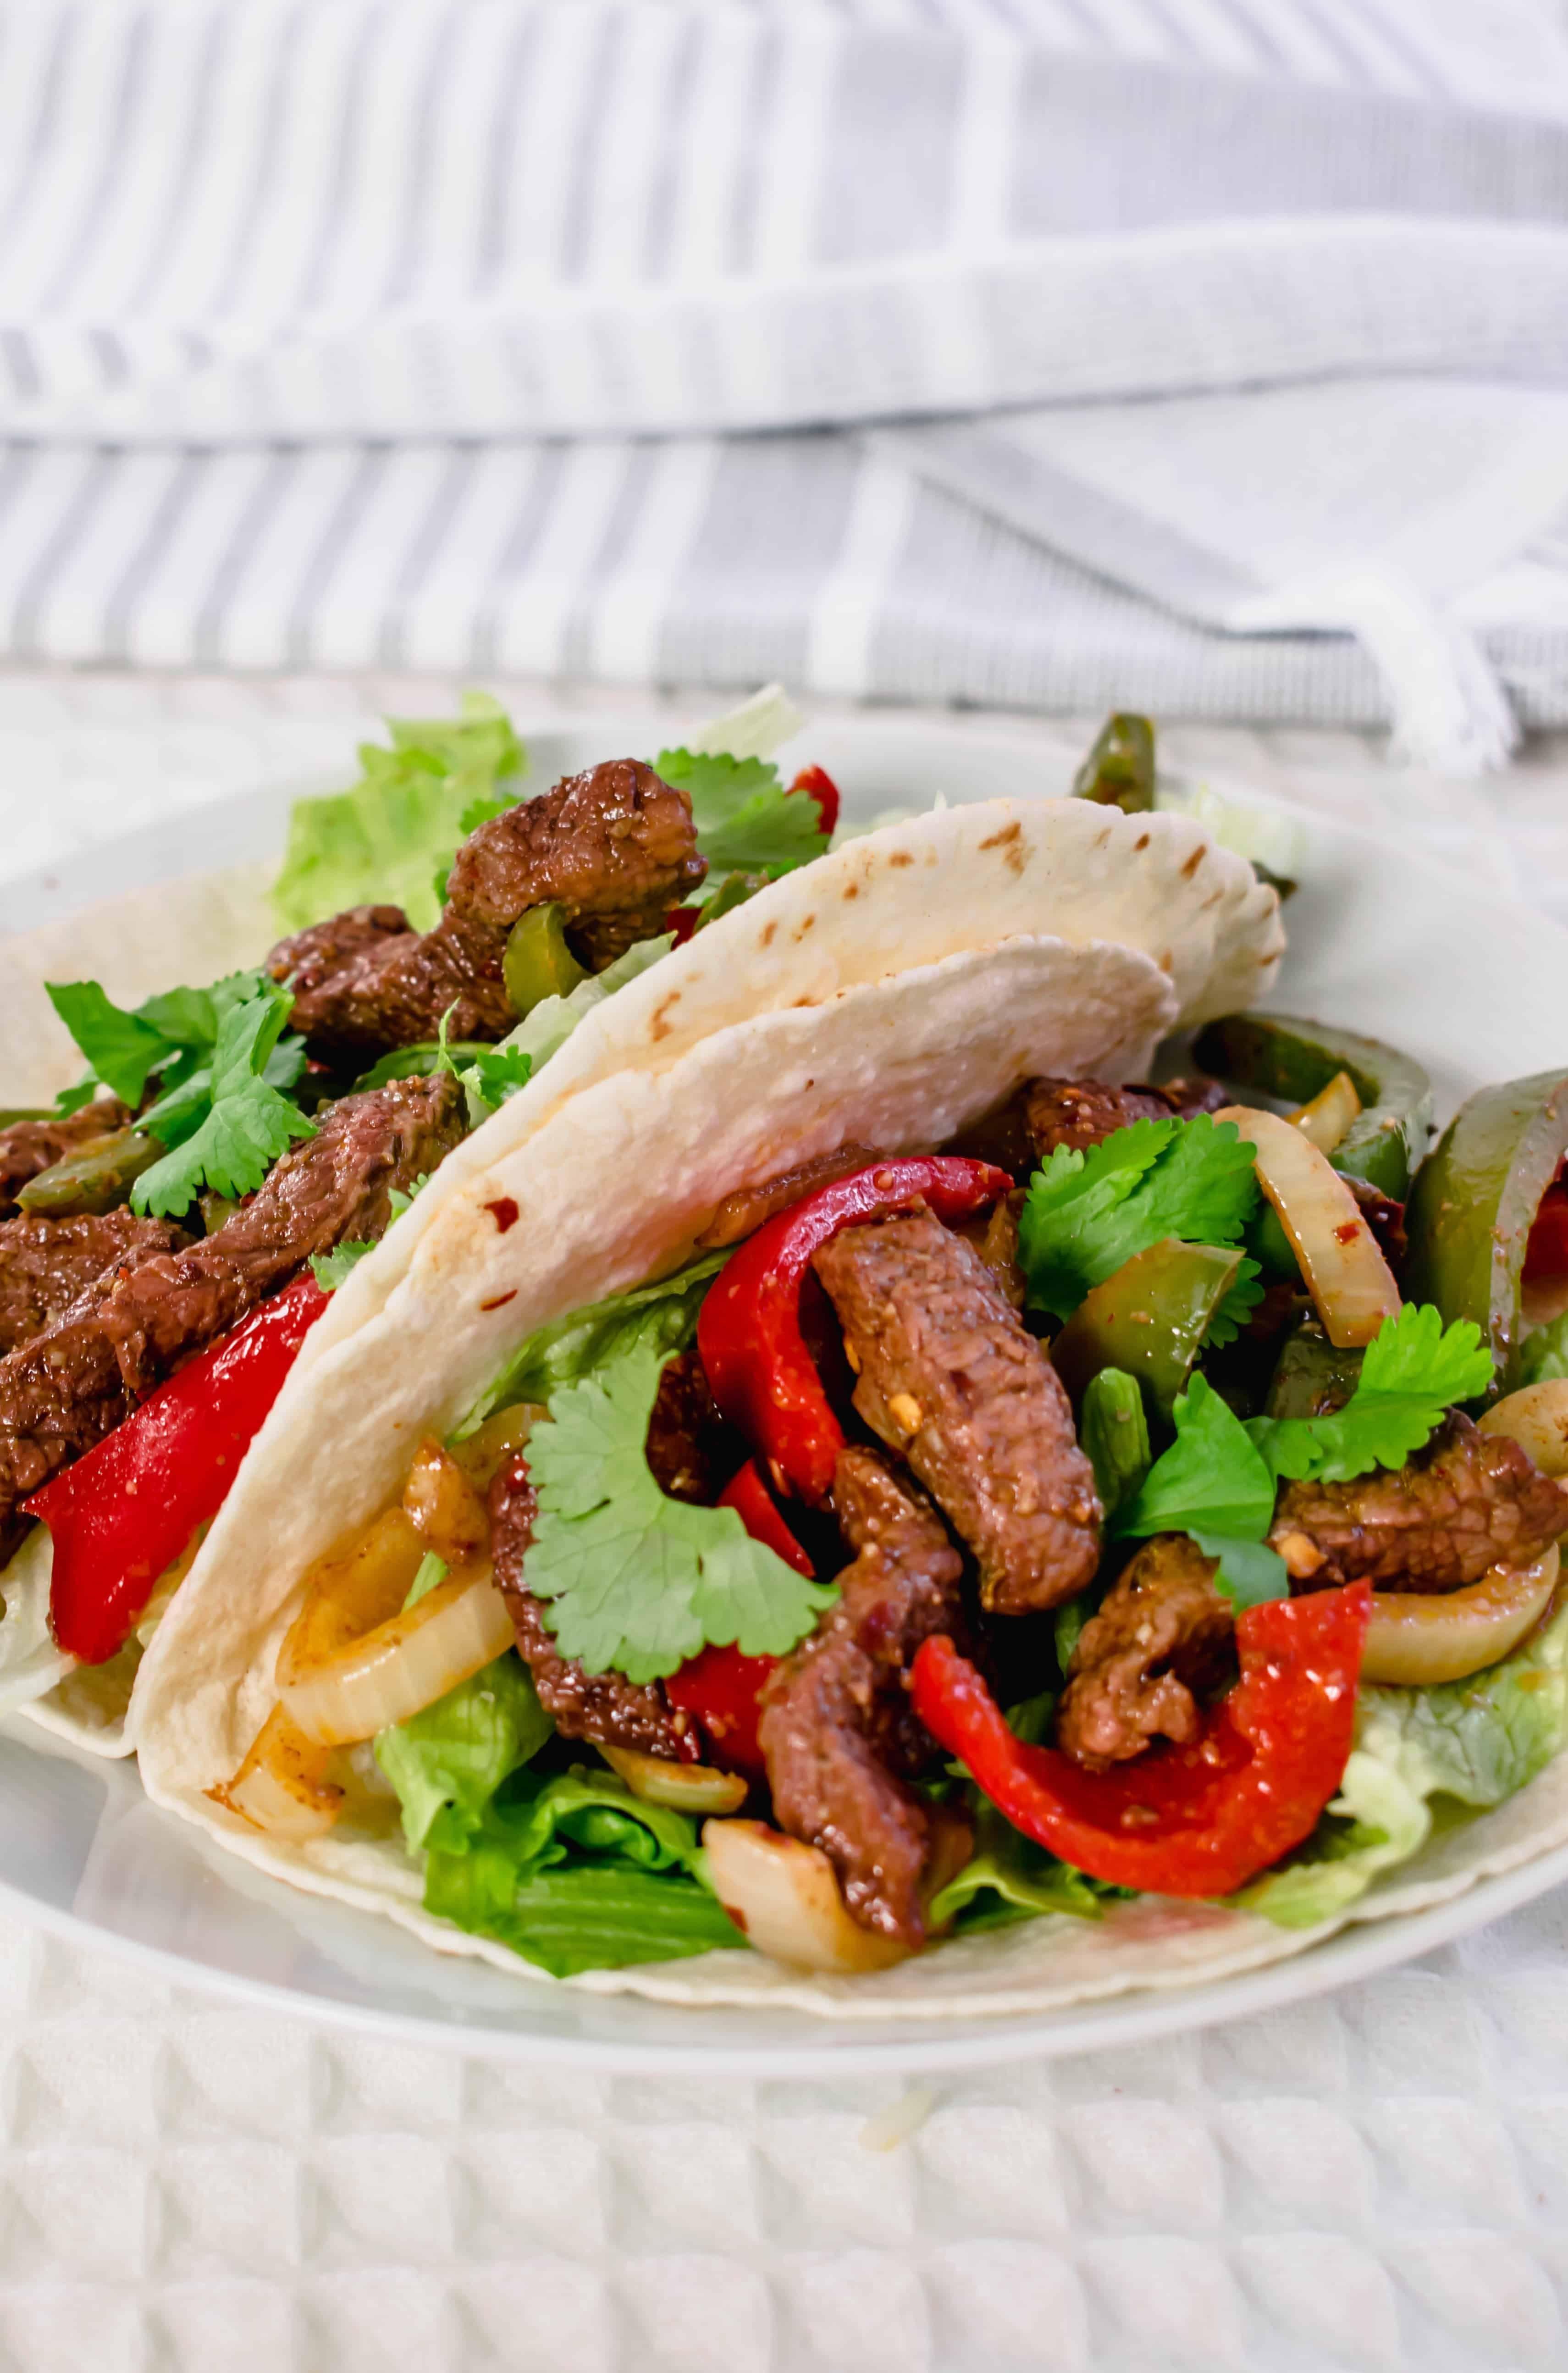 Actifry Steak Fajitas Recipe | Easy & Healthy | Hint Of Helen #steakfajitarecipe Actifry Steak Fajitas Recipe | Easy & Healthy | Hint Of Helen #beeffajitarecipe